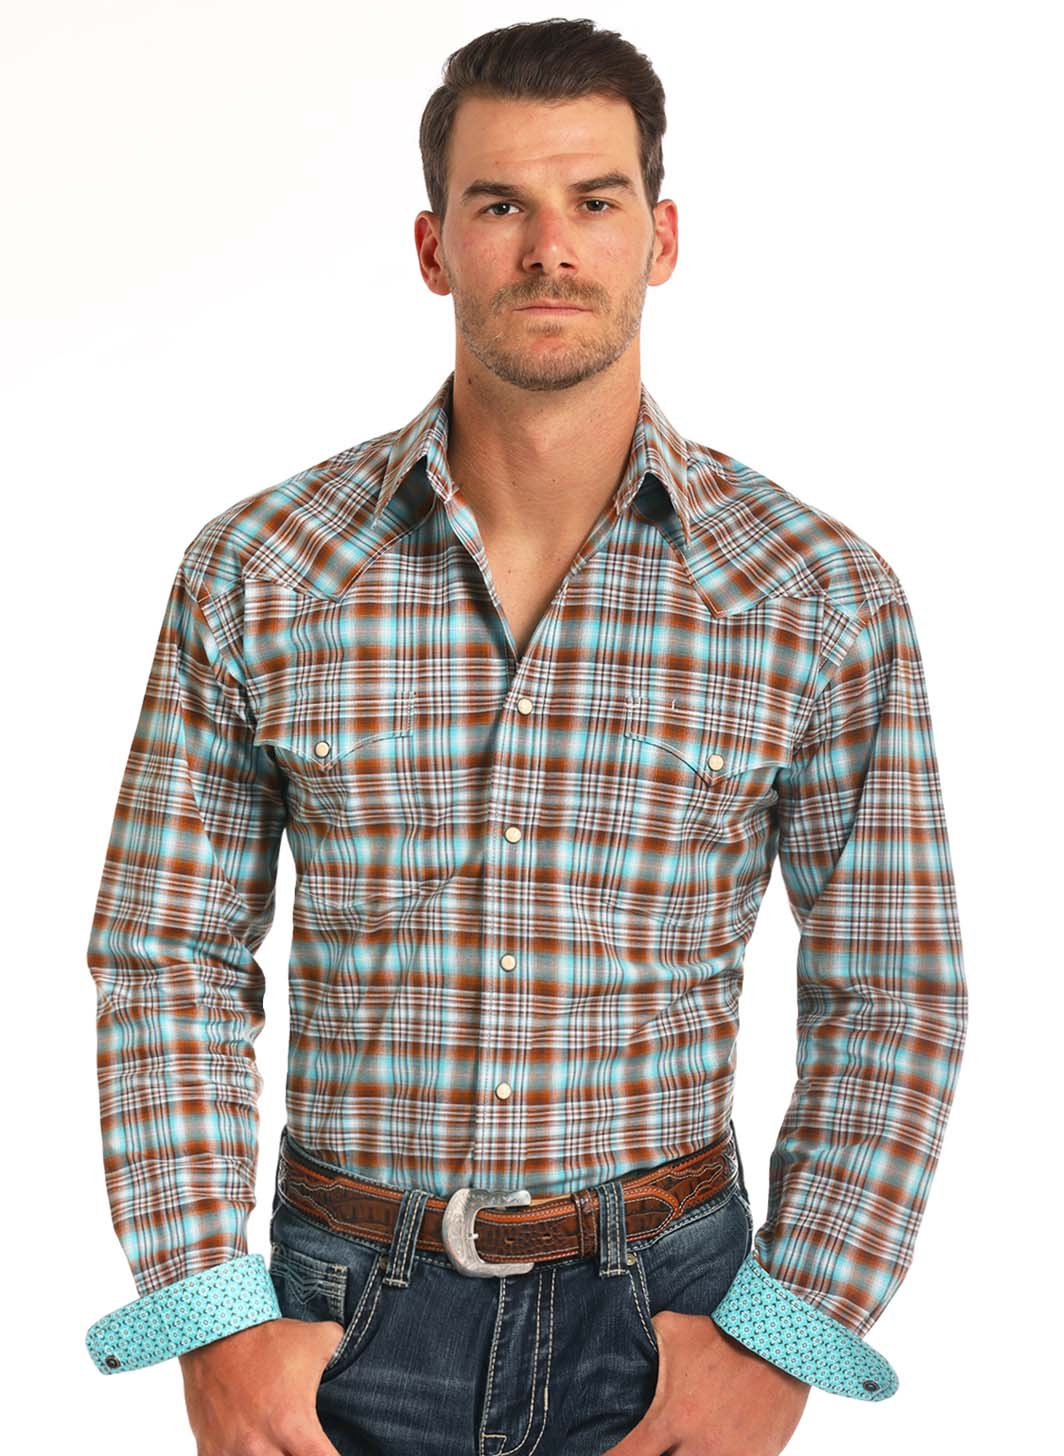 panhandle_8_seconds_western_wear